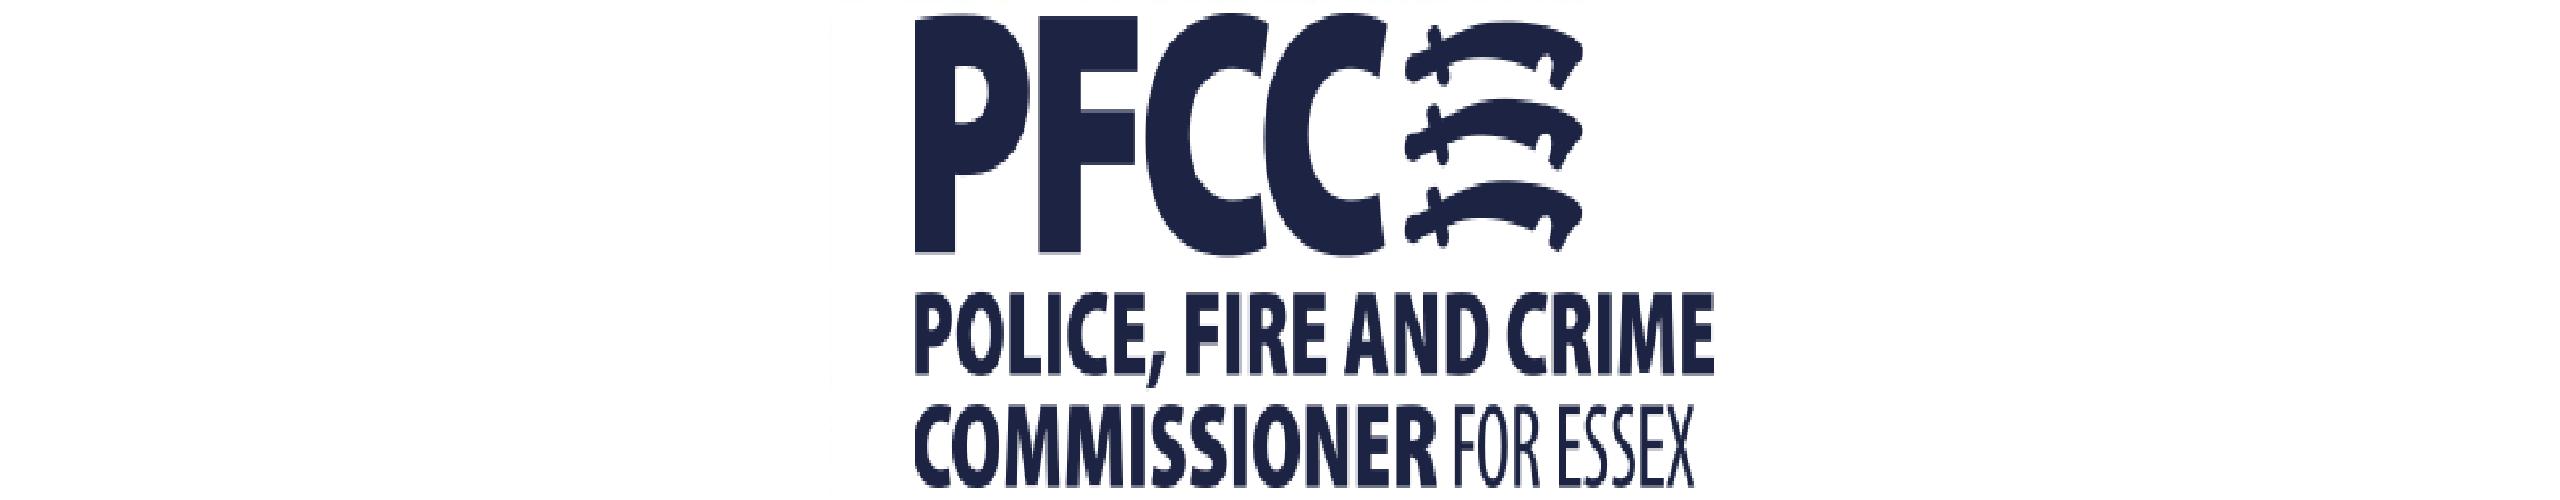 PFCC panel background